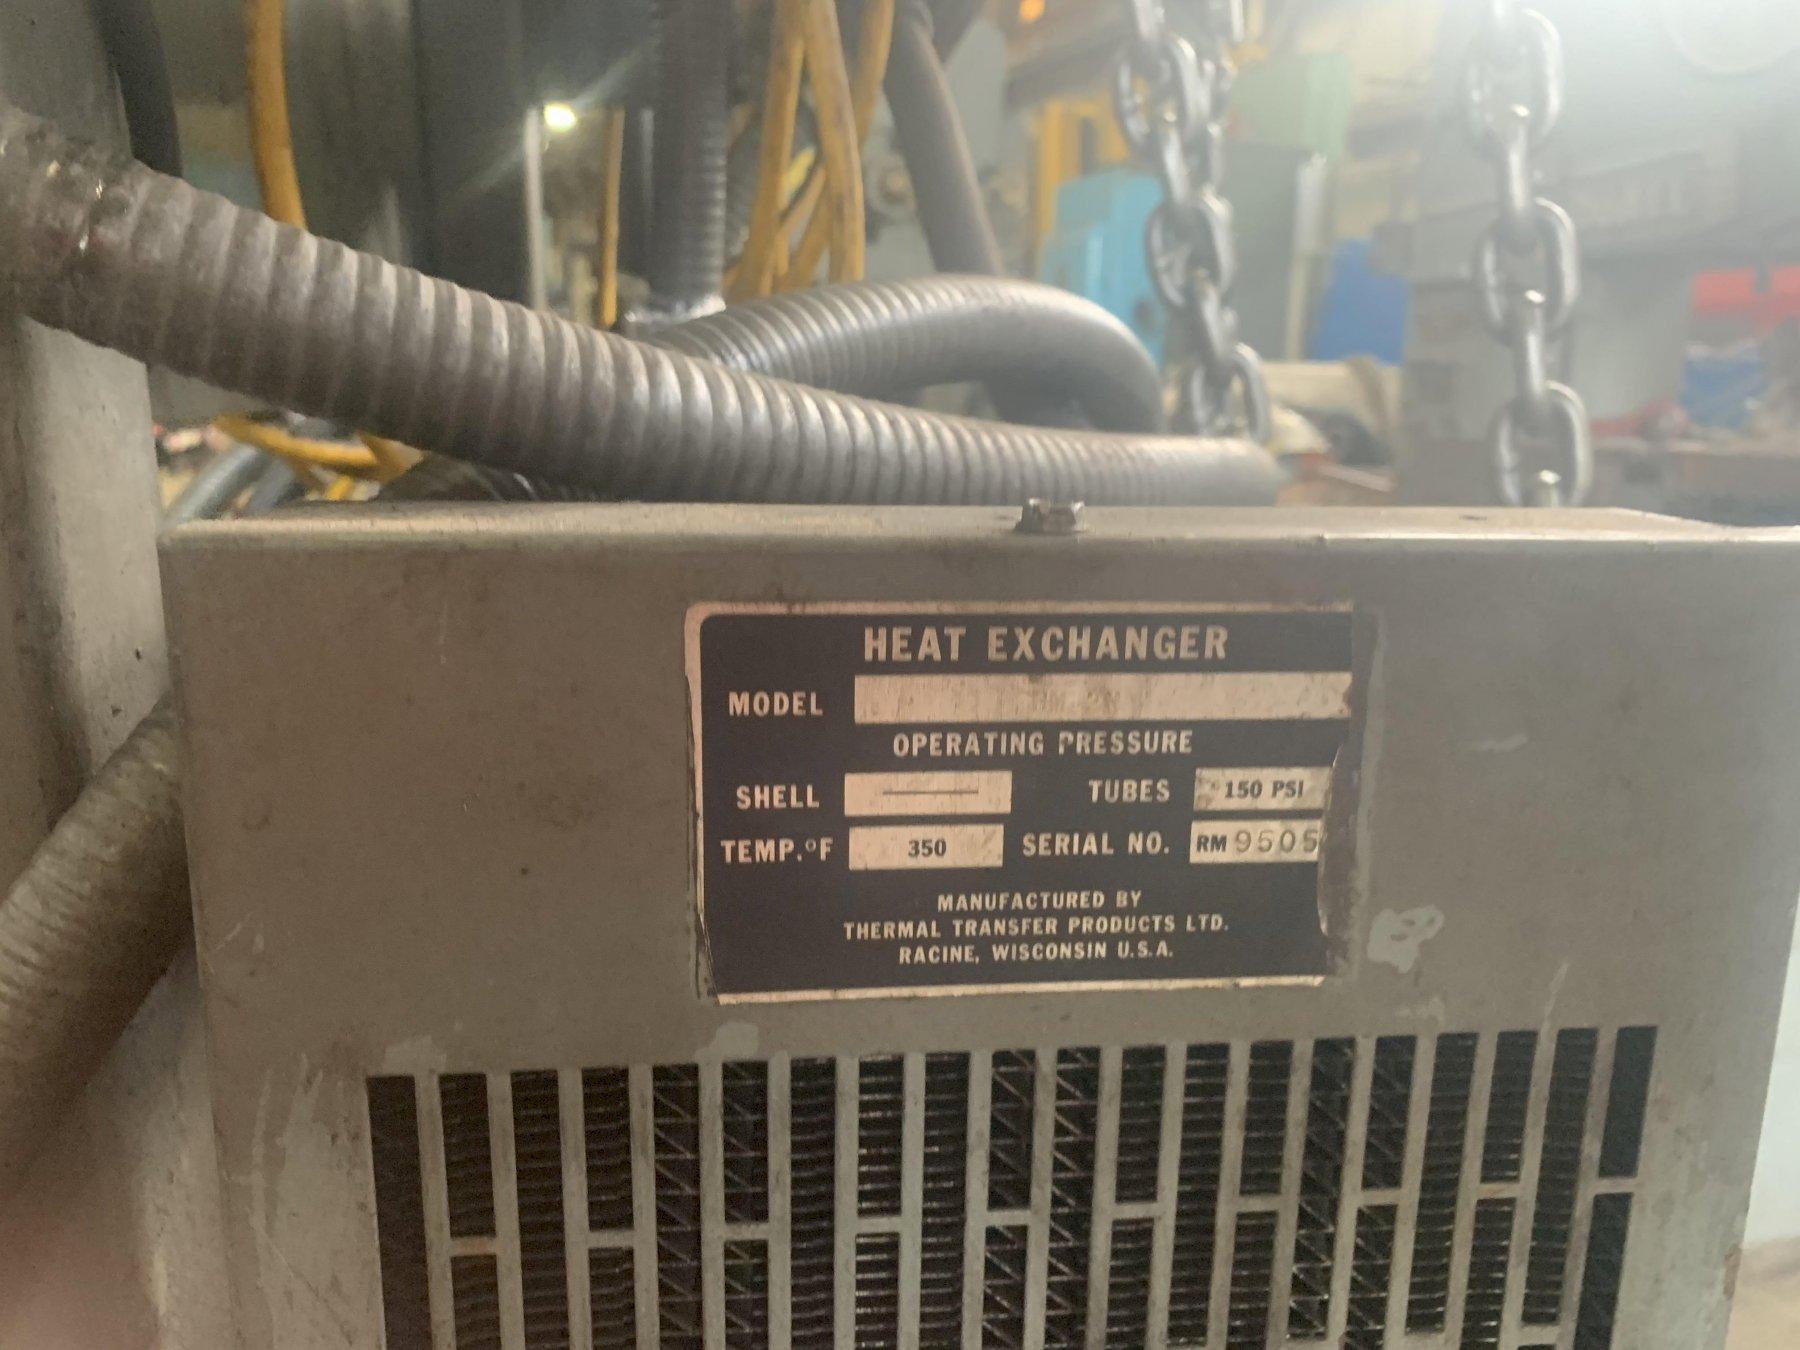 7.5 HP POWER HYDRAULIC PUMP UNIT: STOCK 13415